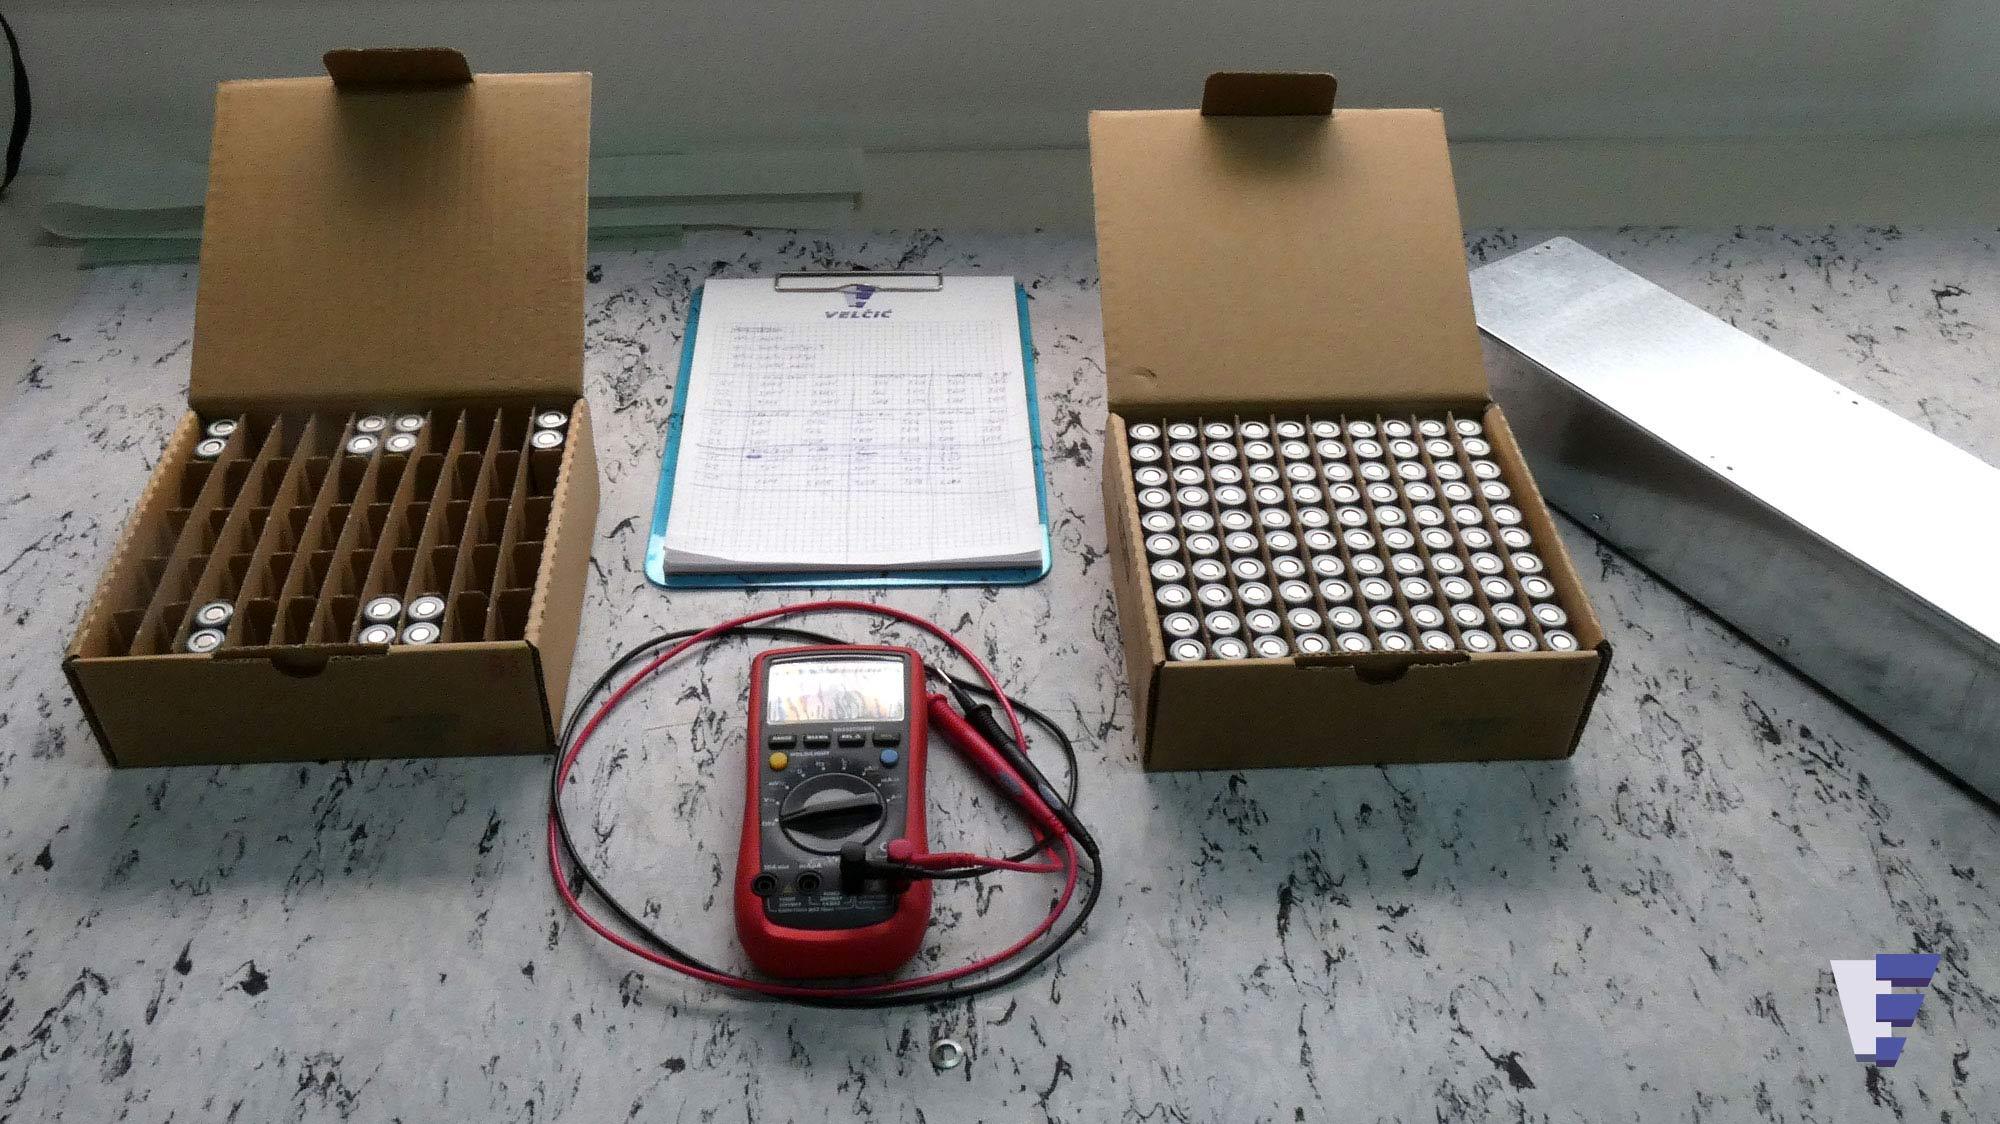 Velčić Ltd - Li-Ion battery modules - renewable marine energy